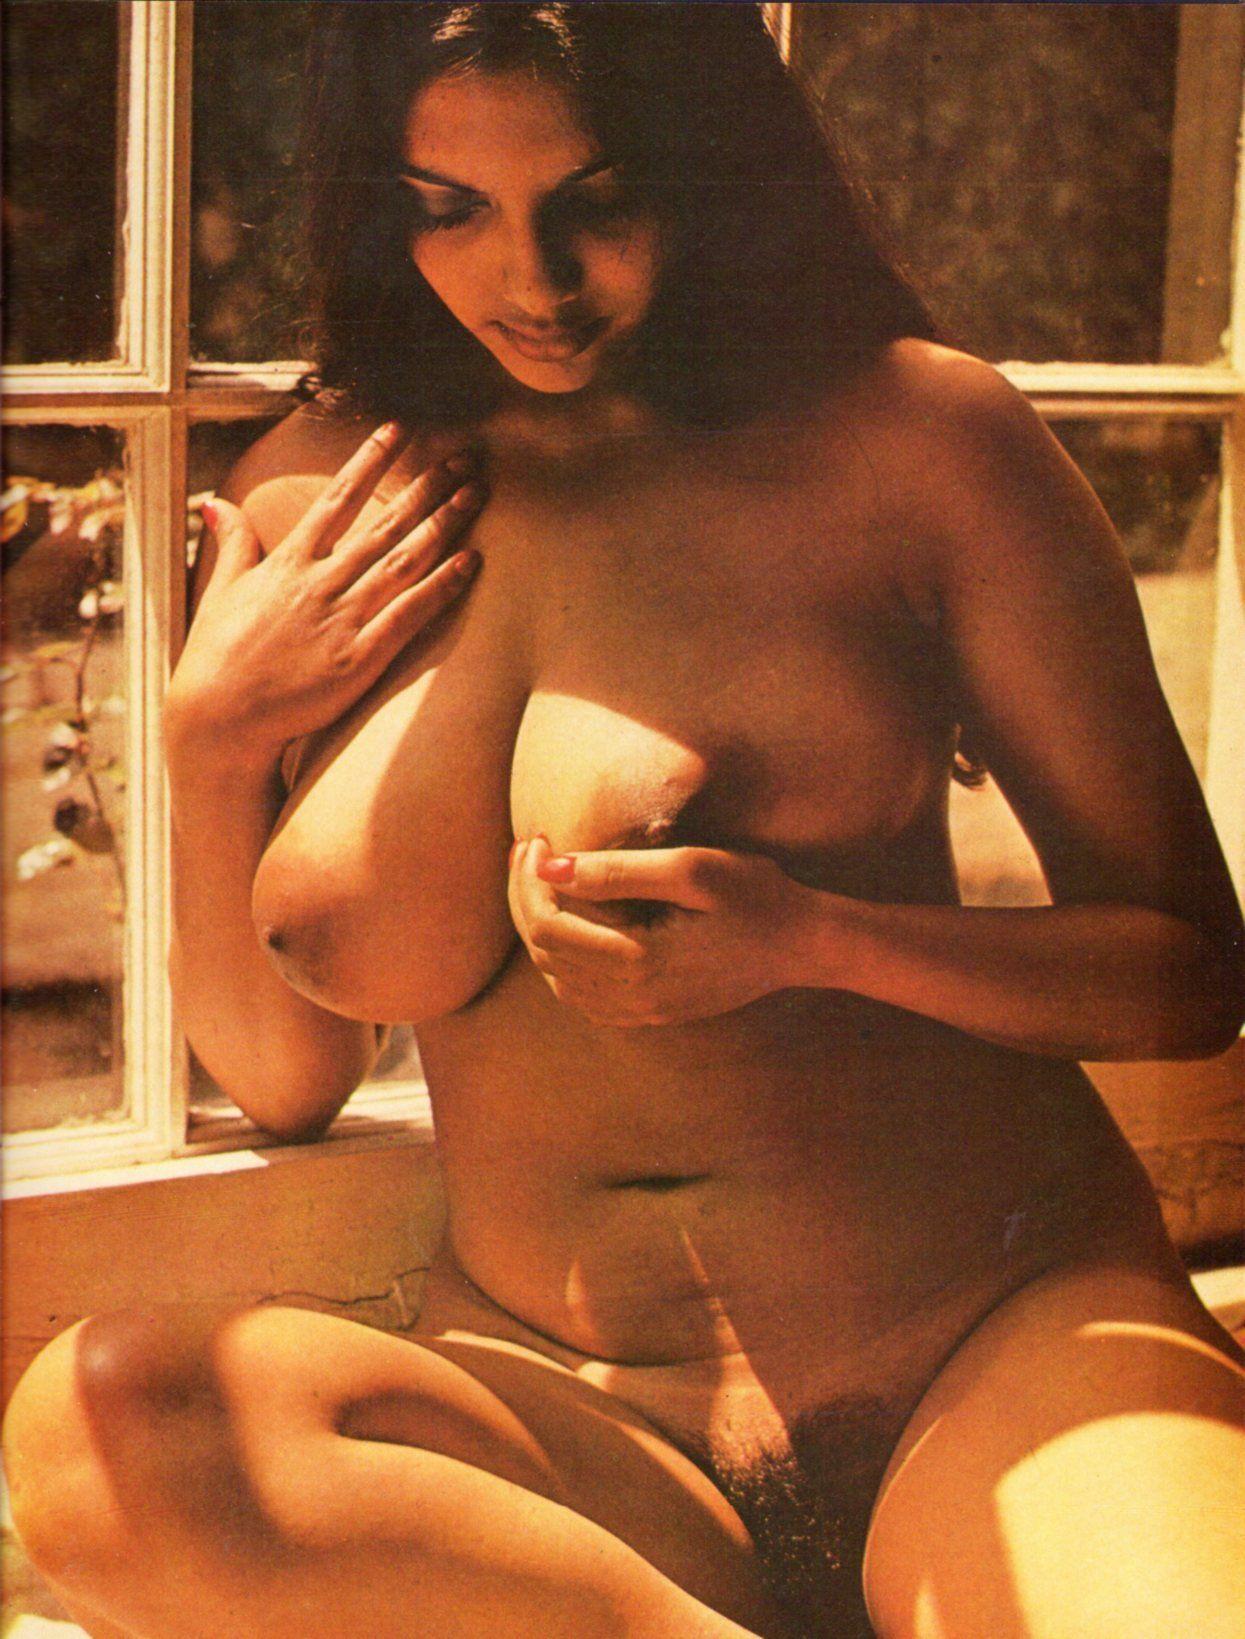 Nude deboniar magazine aunty pics